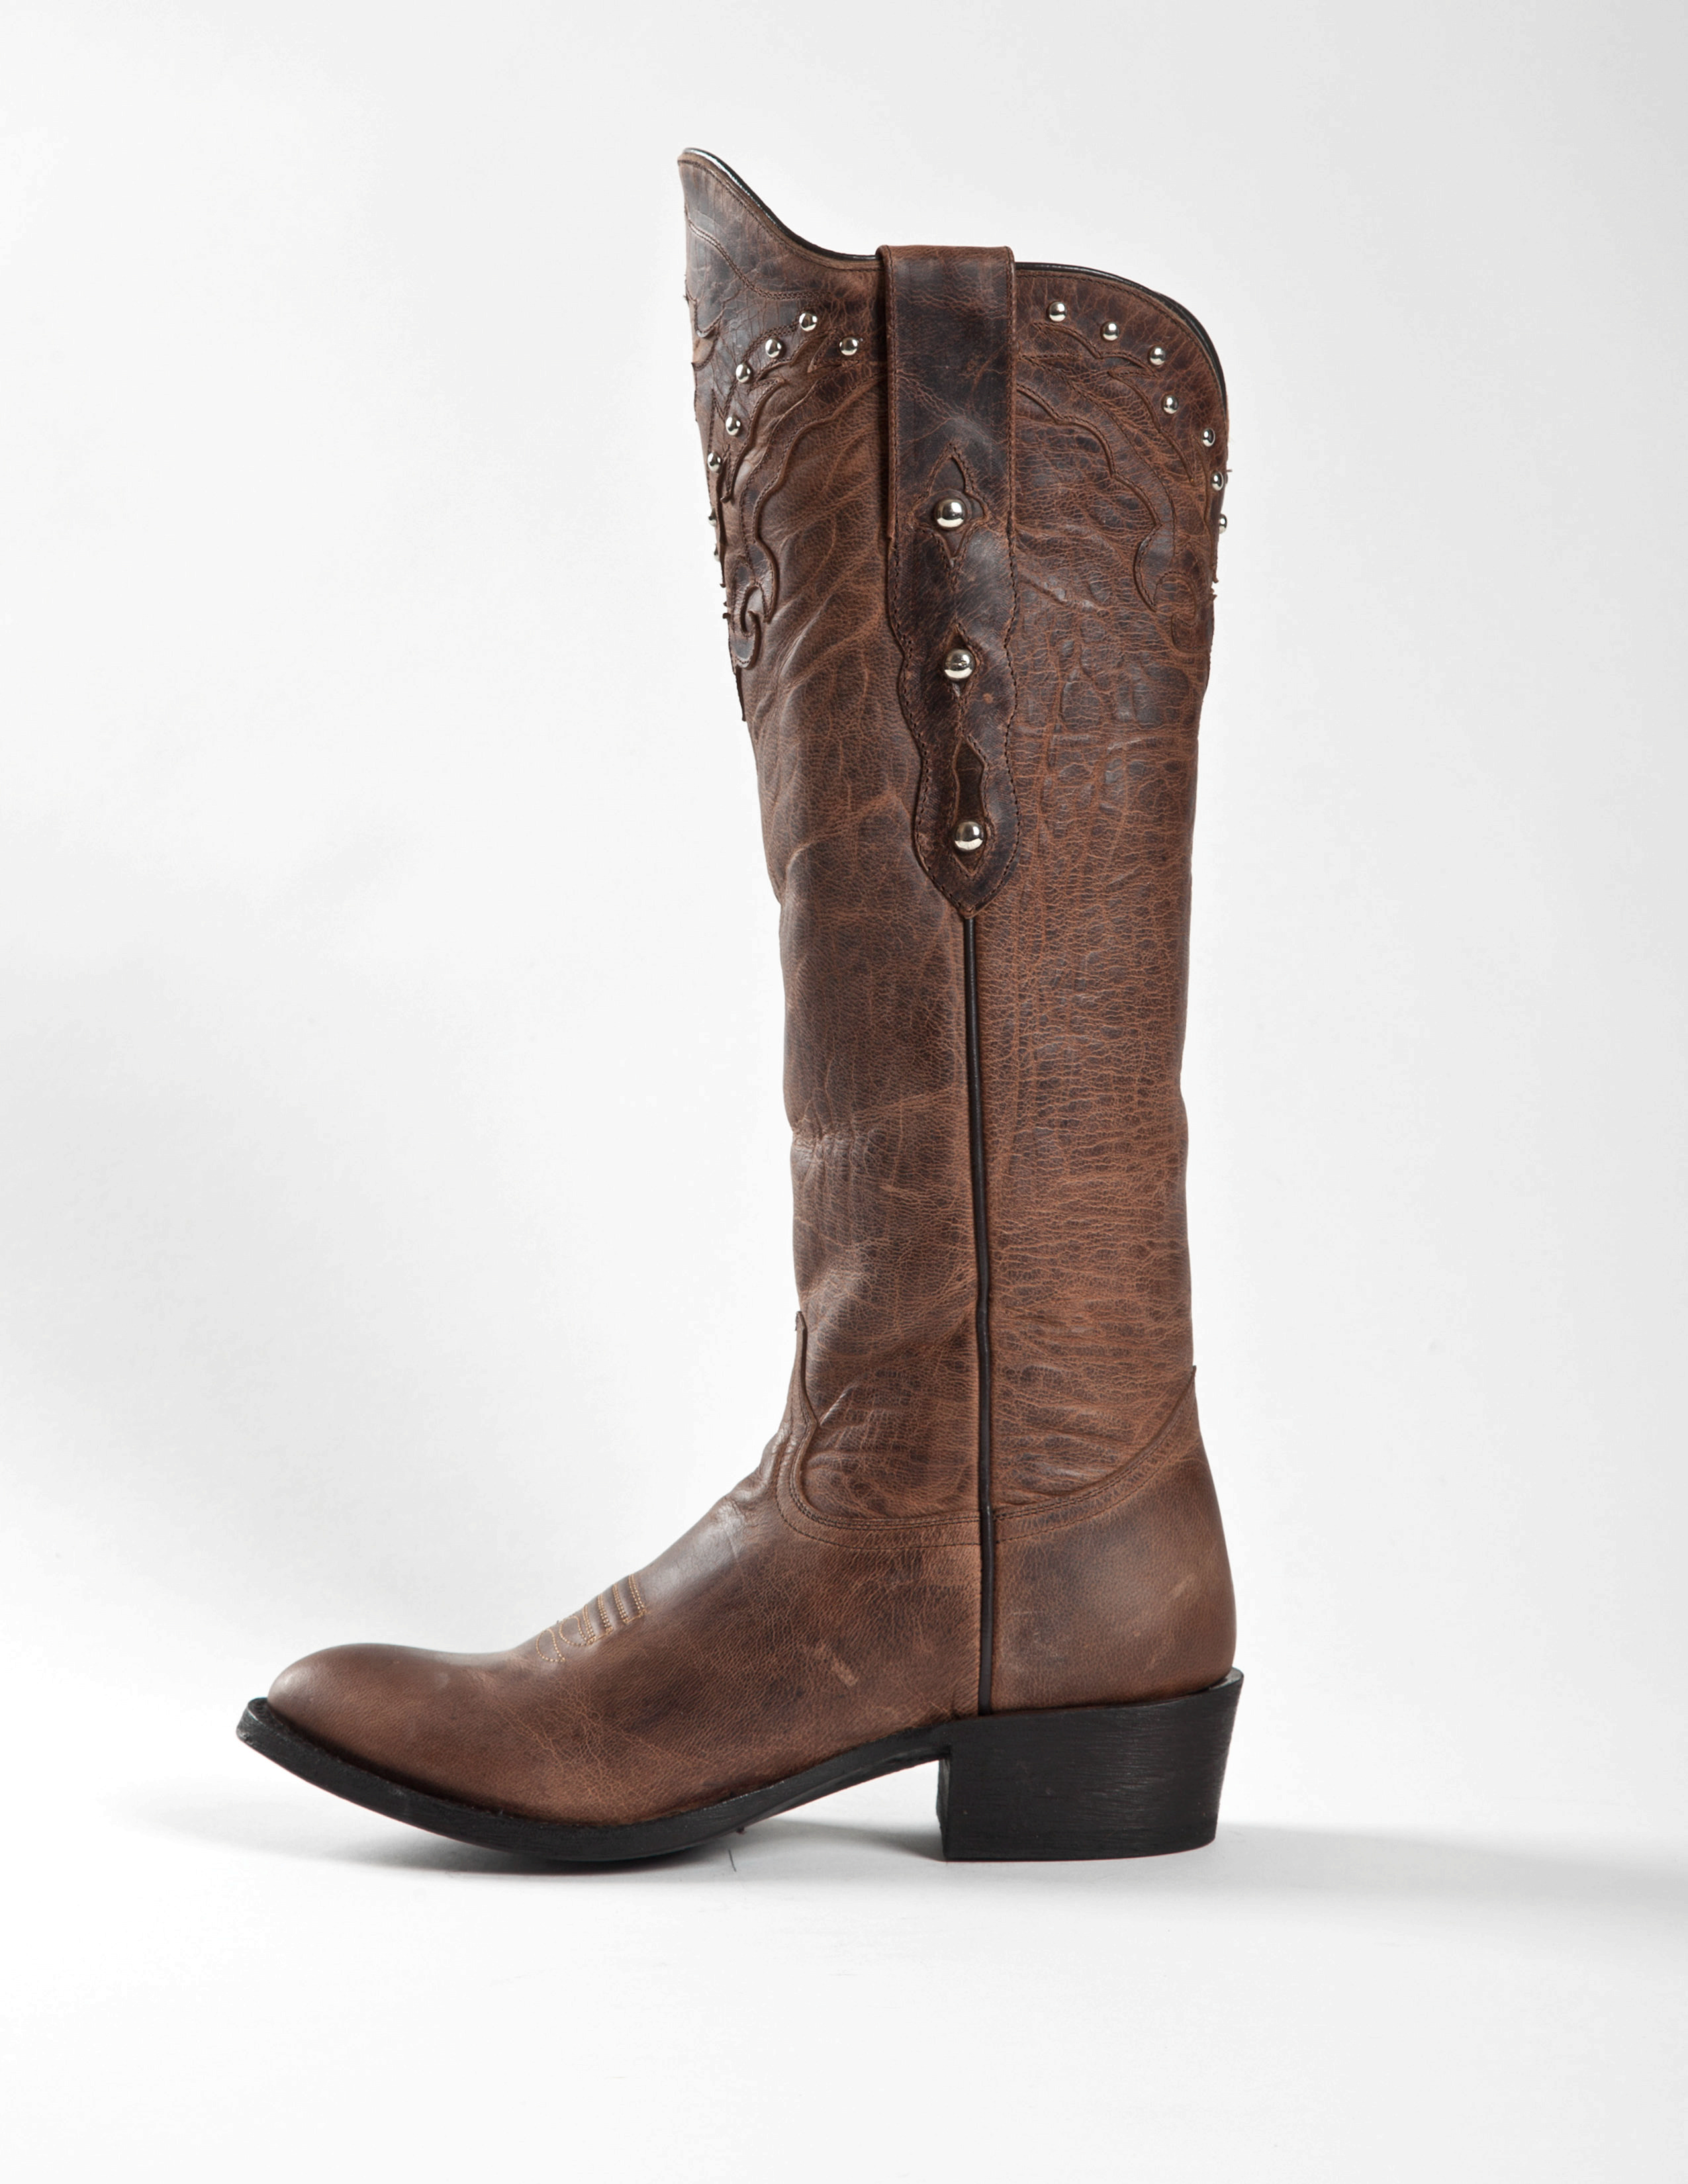 Johnny Ringo Women's Knee High JRS806-16B Western Boots